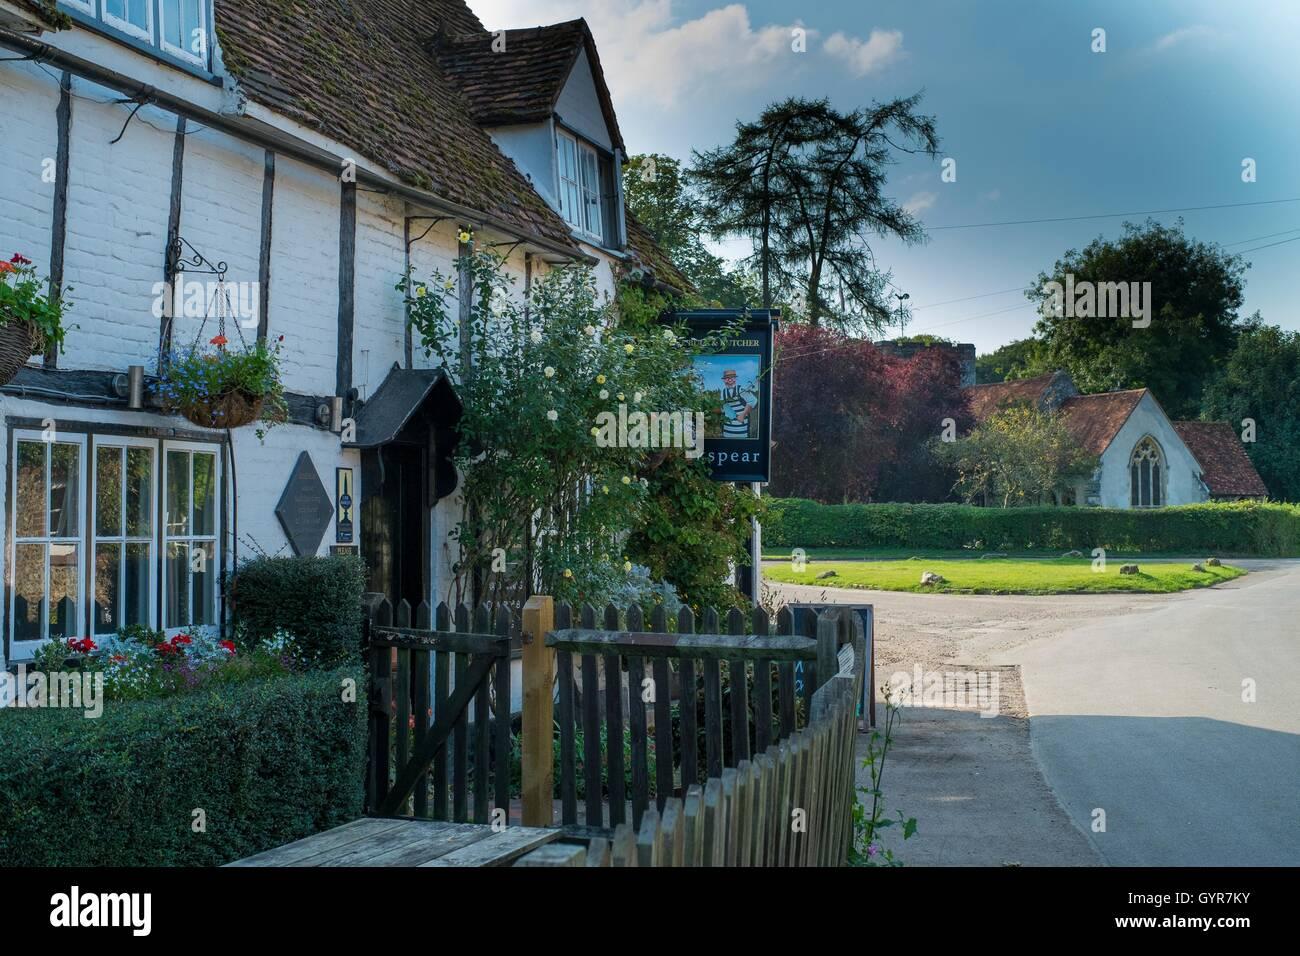 The Bull & Butcher Pub, Turville Village, The Chilterns, Buckinghamshire. - Stock Image